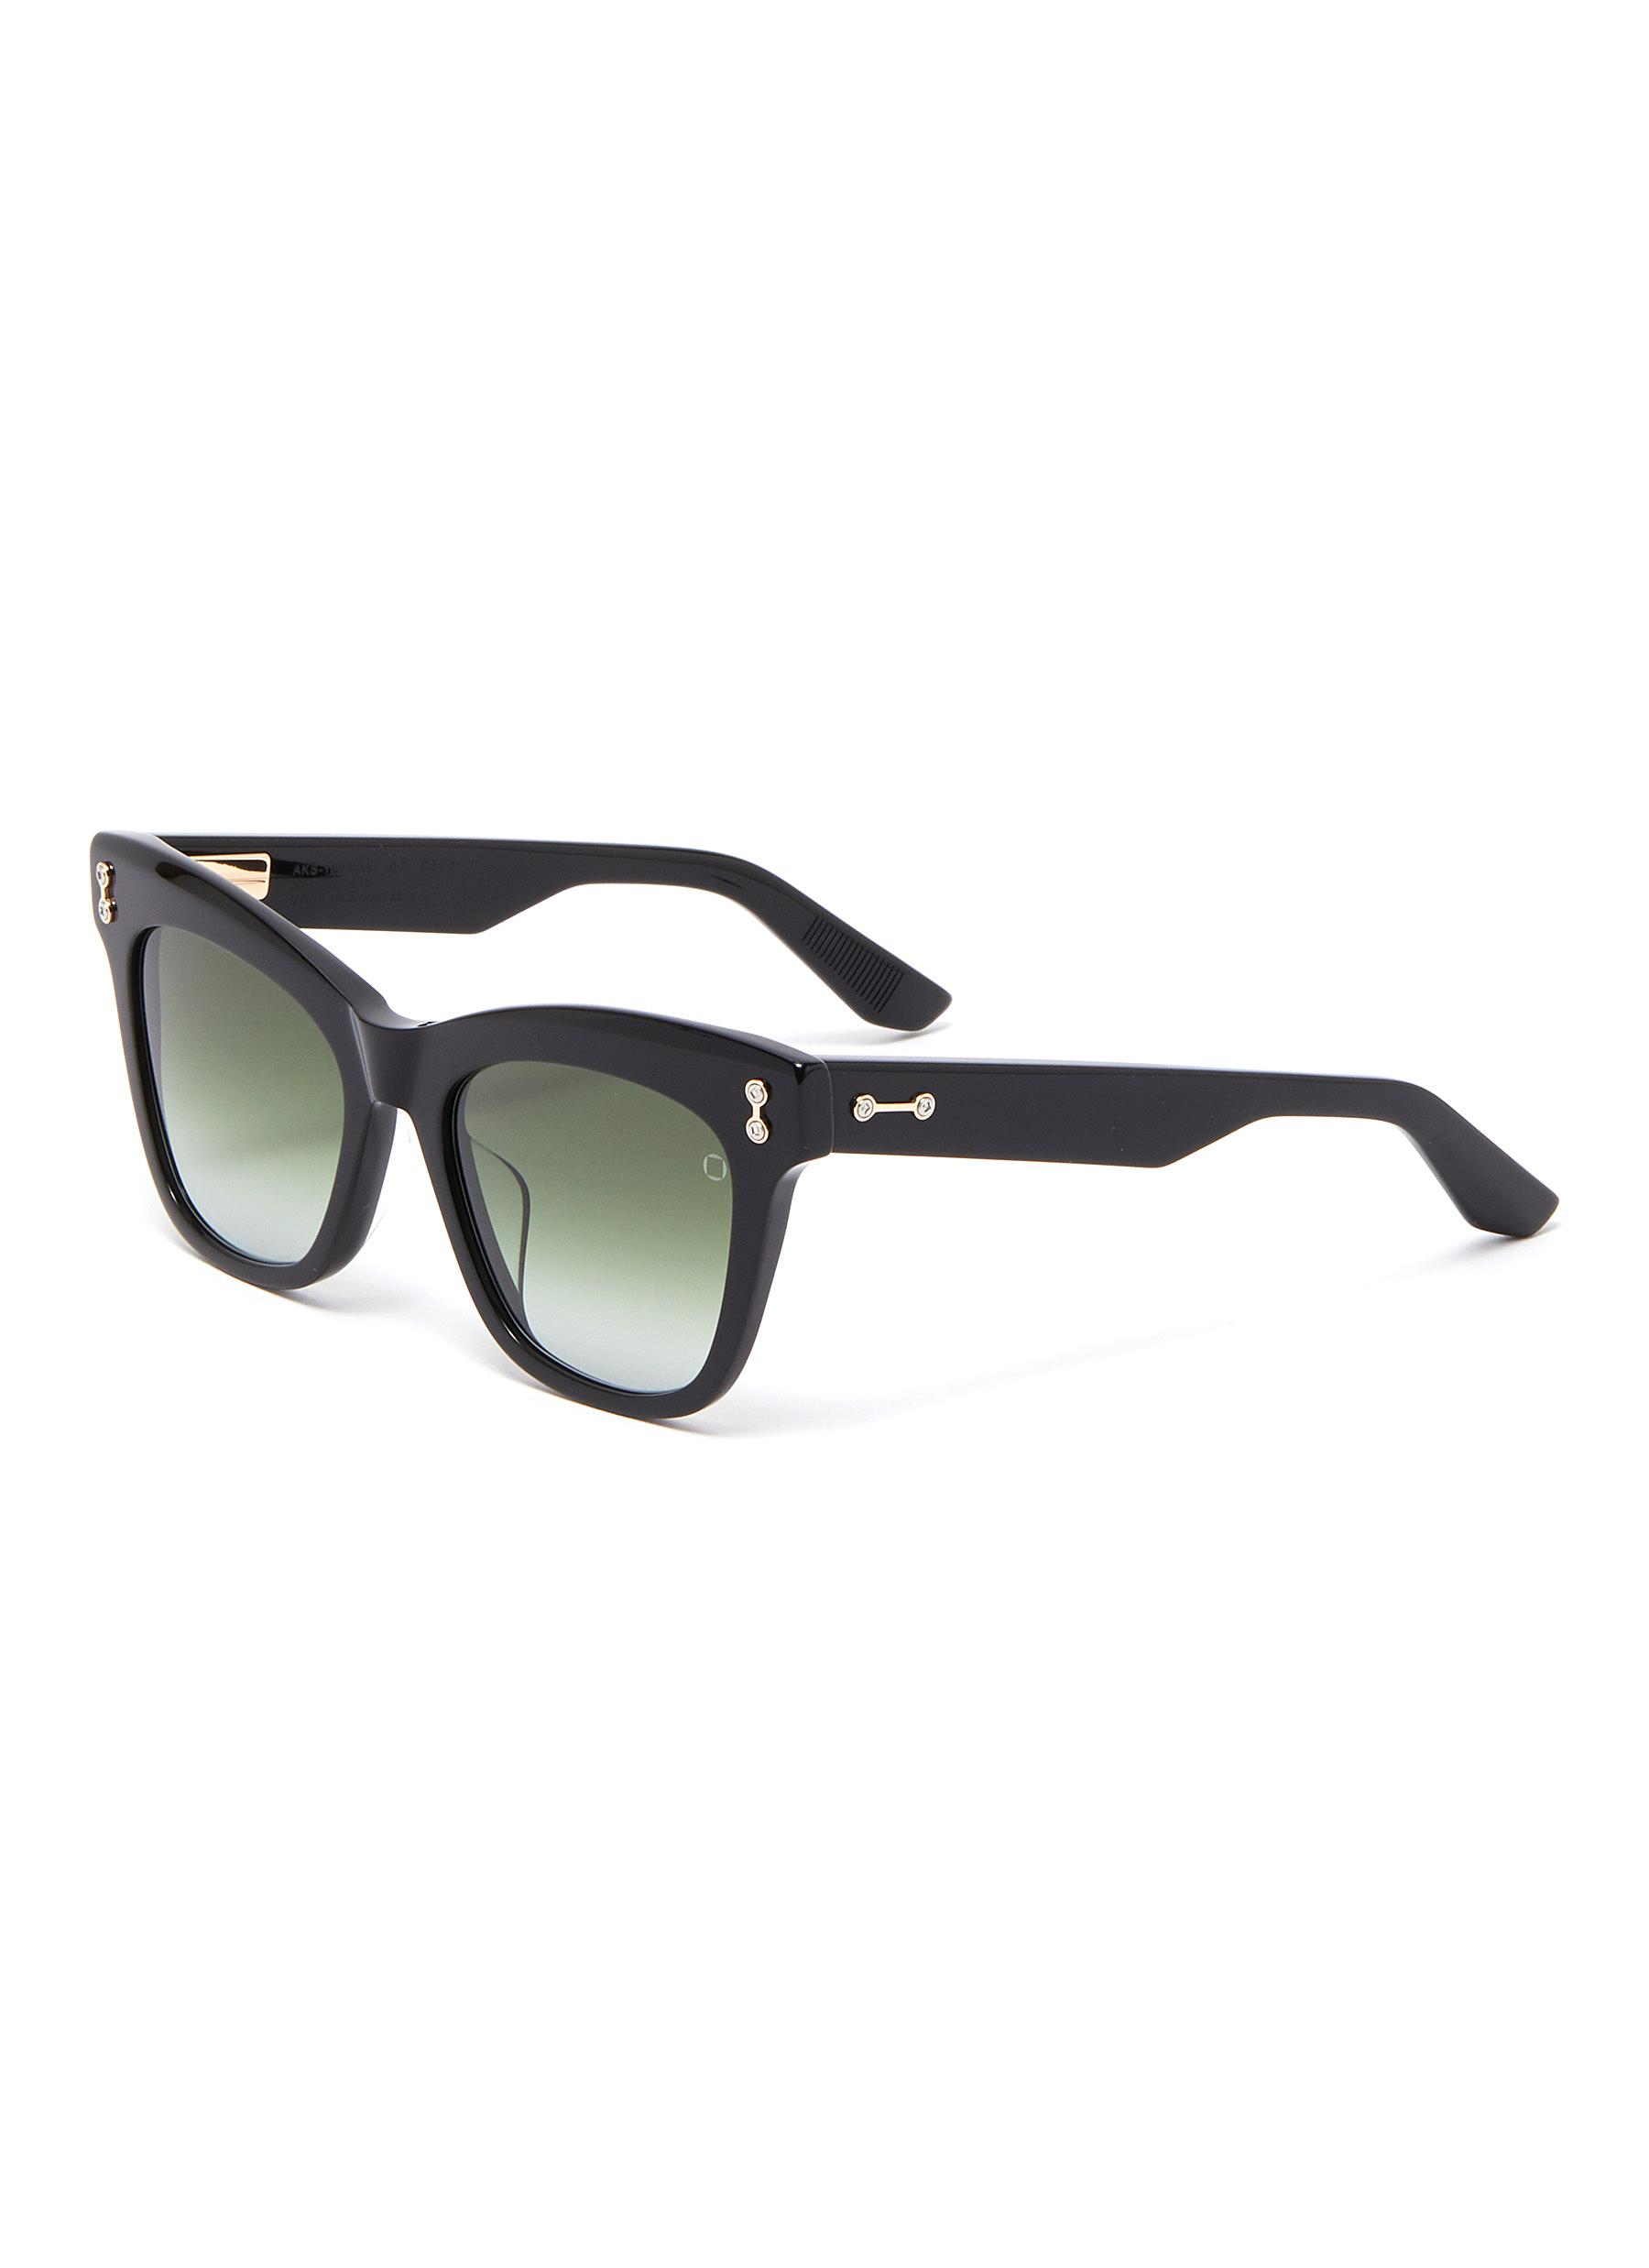 'Vela' acetate wayfarer sunglasses